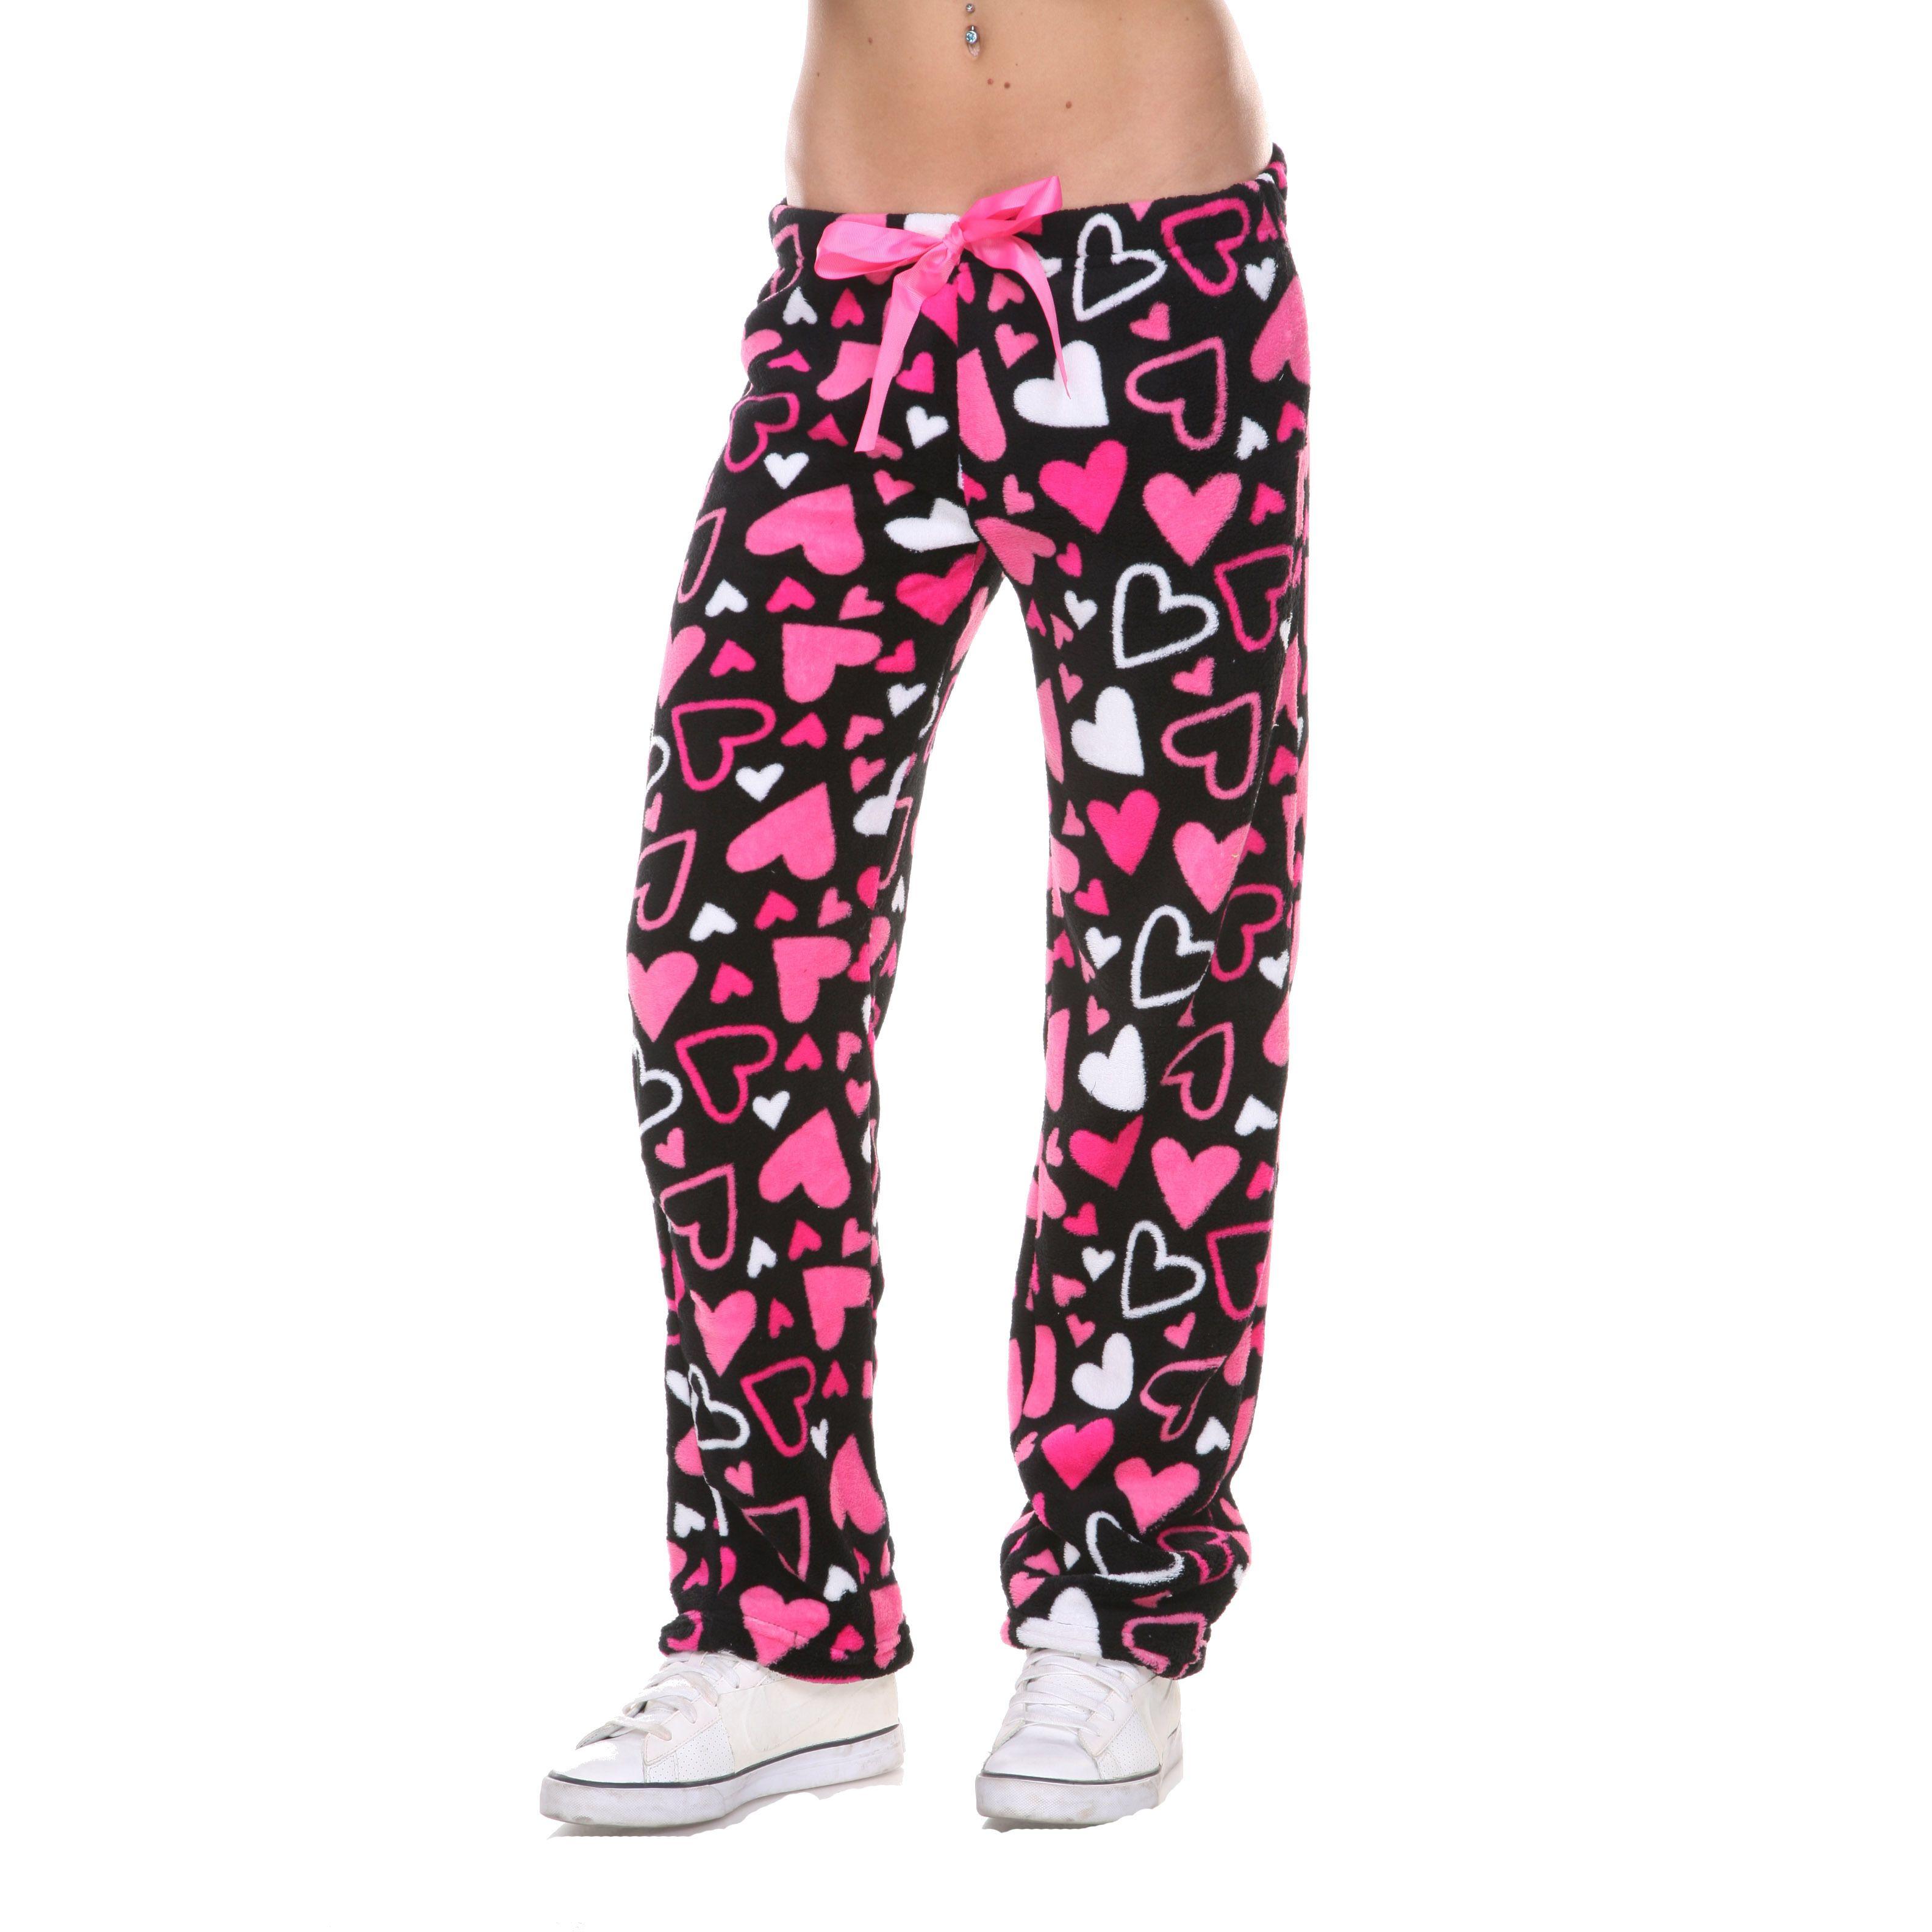 Stanzino Women's Heart Print Plush Lounge Pants